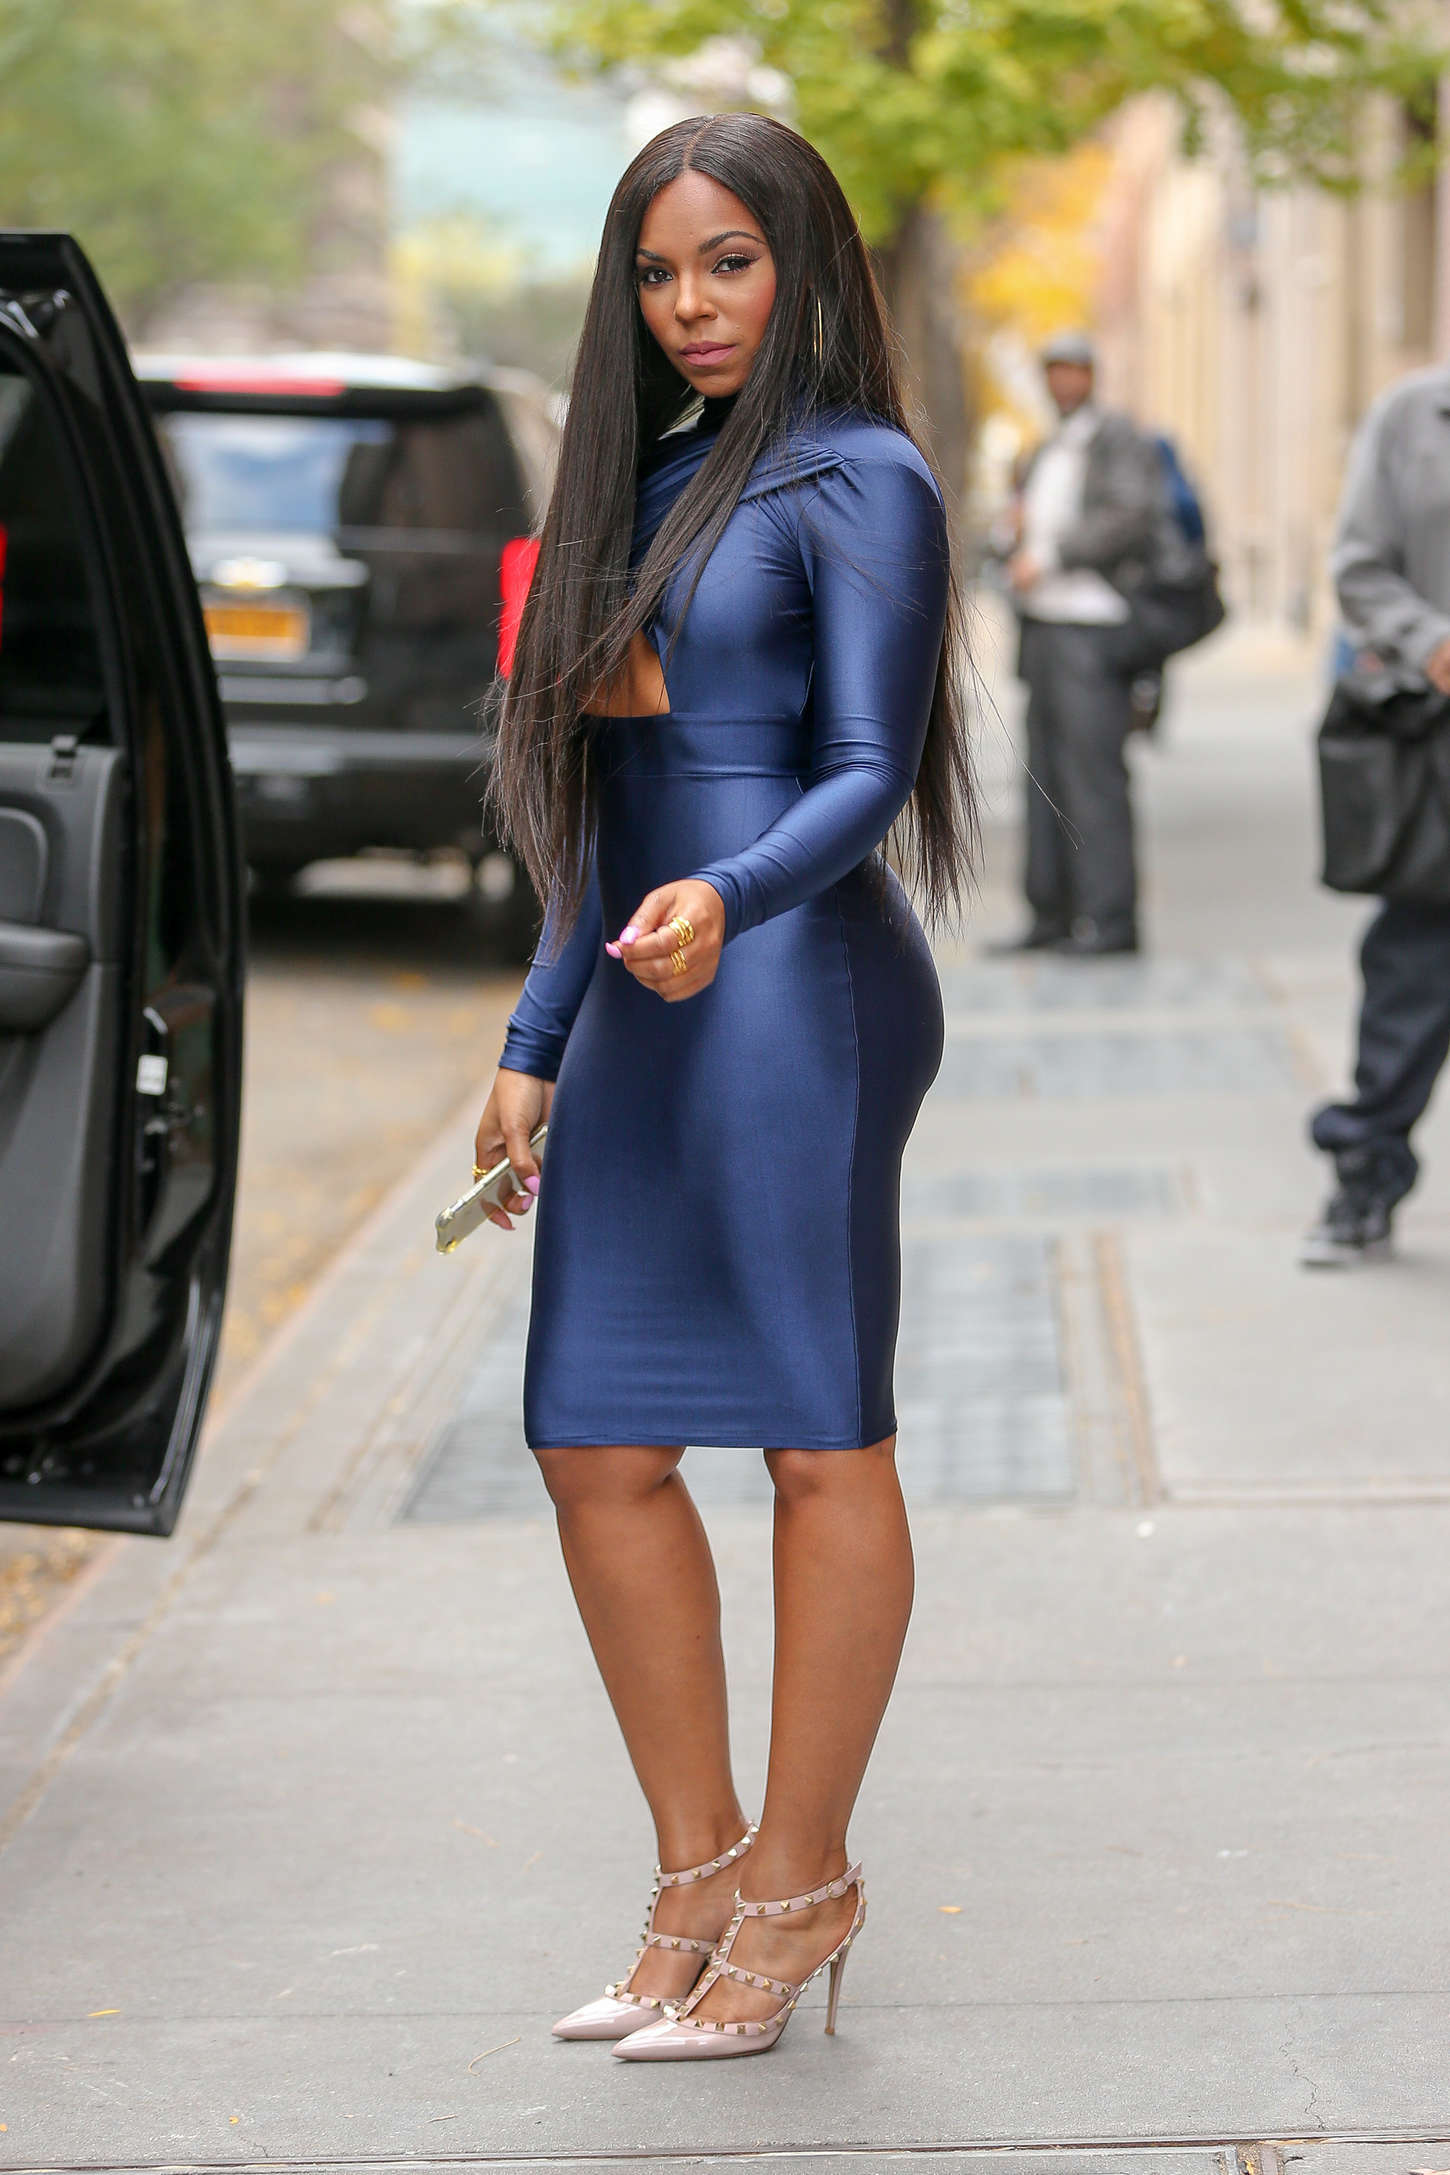 Ashanti In Tight Dress At The View 07 Gotceleb